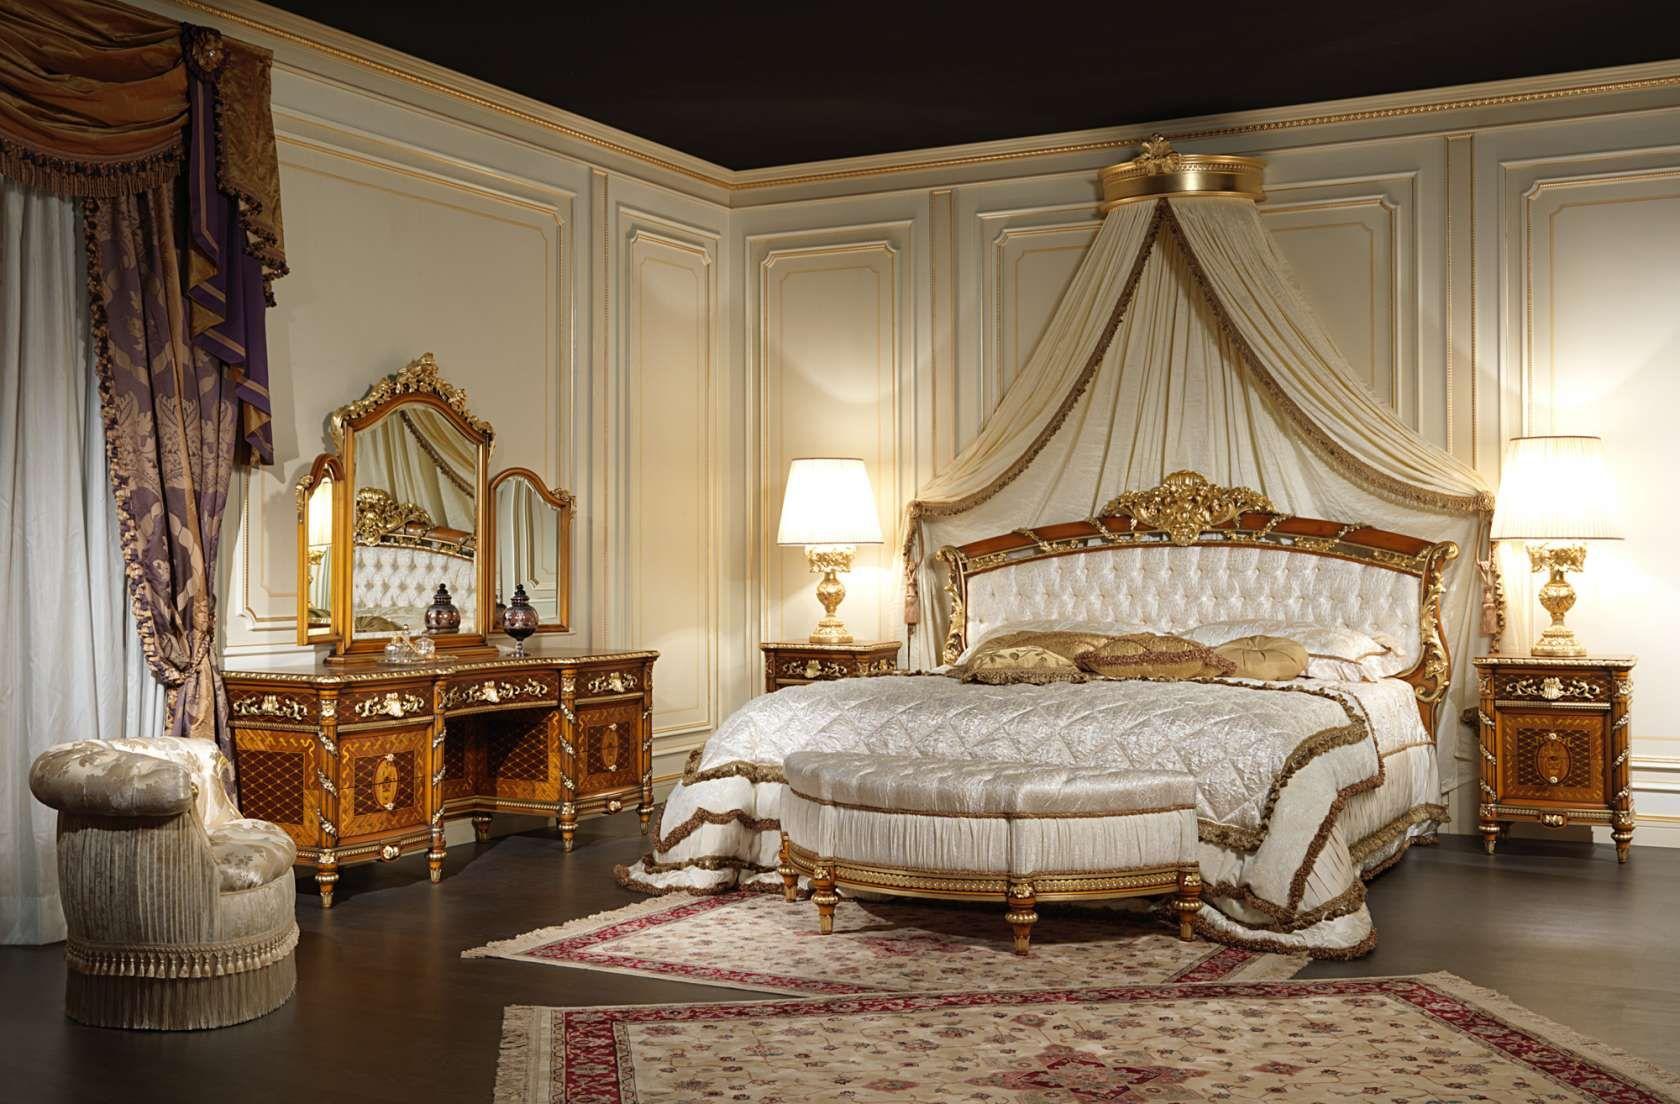 Walnut Bedroom Furniture Louis Xvi Noce E Intarsi Art 2017